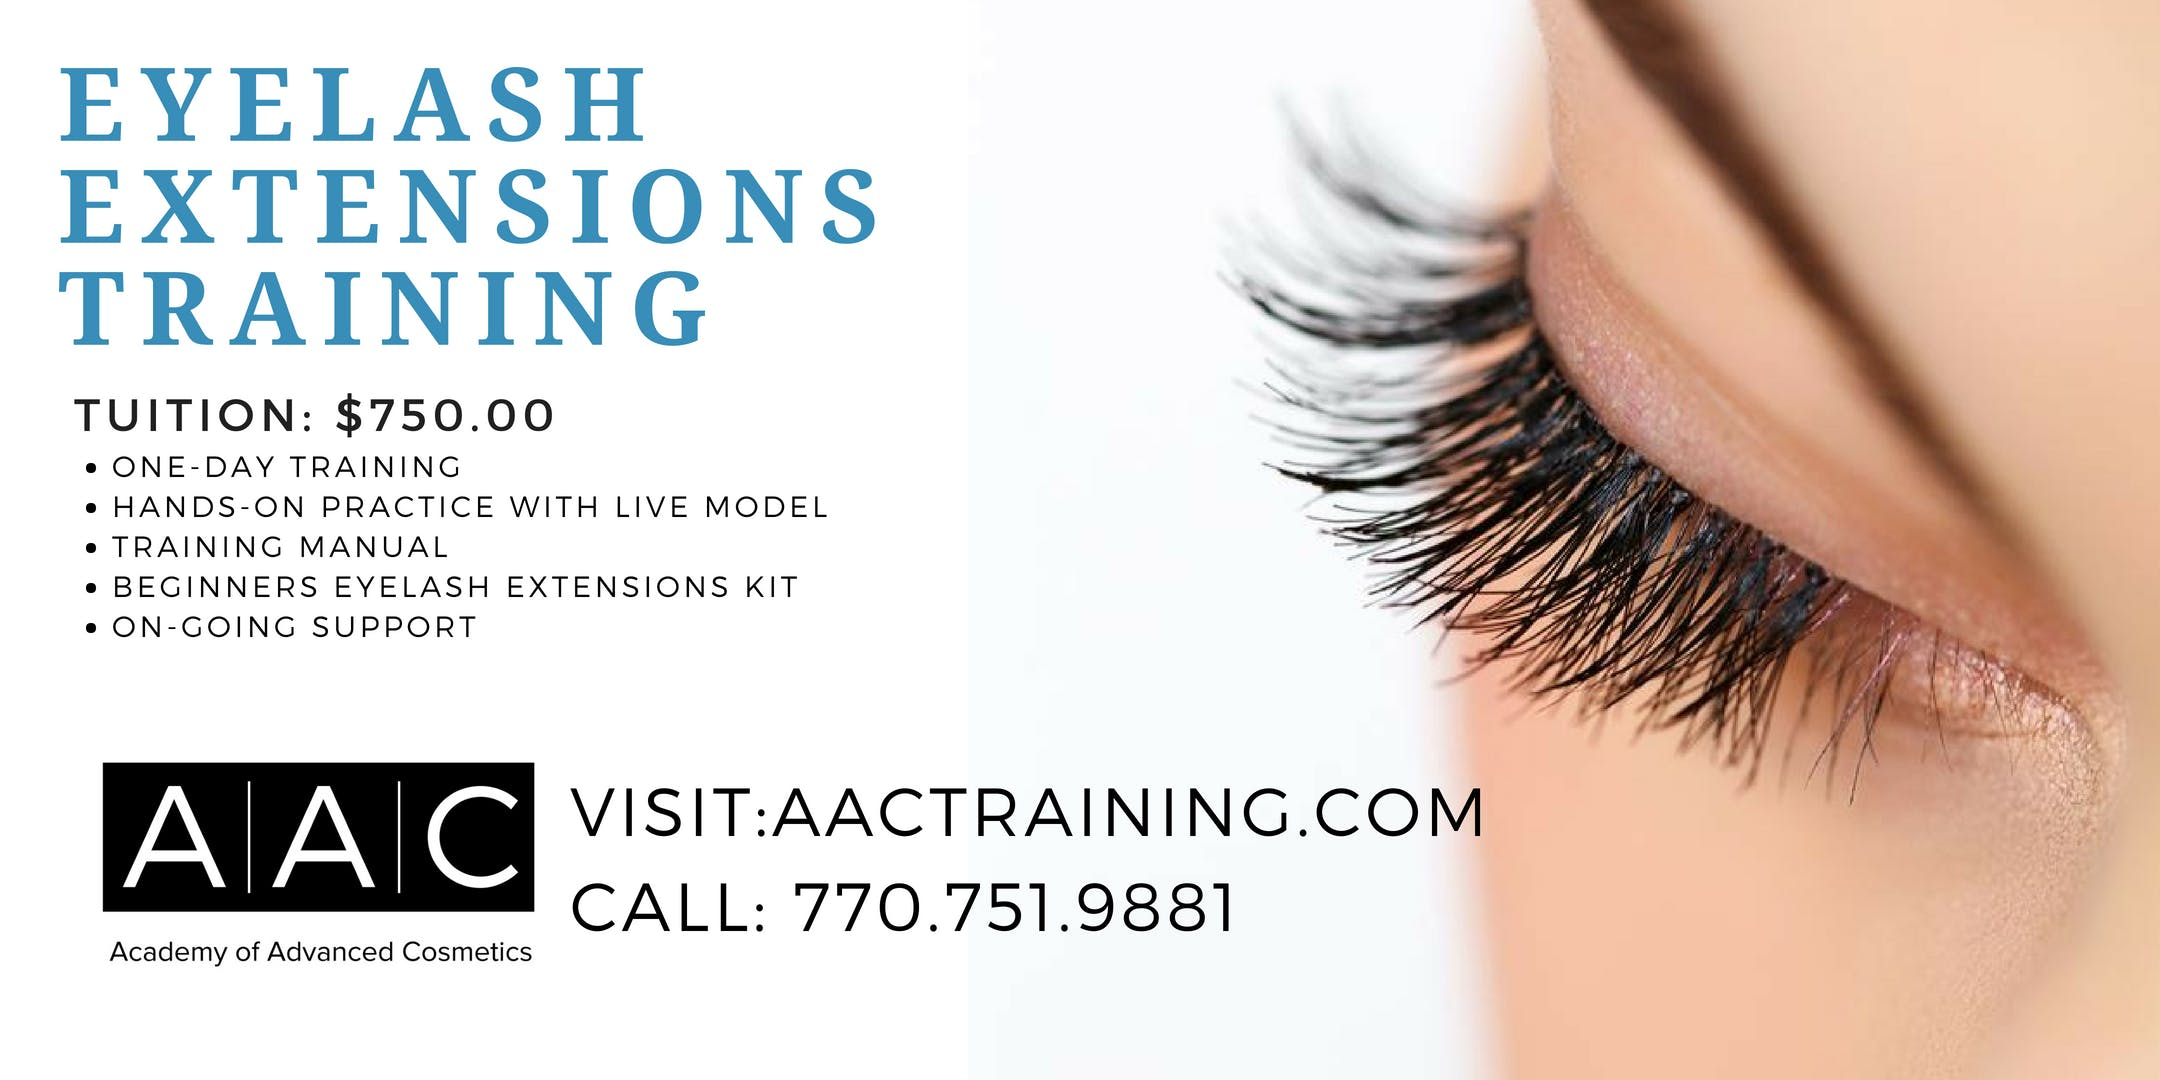 Eyelash Extensions Certification Training 6 Dec 2018